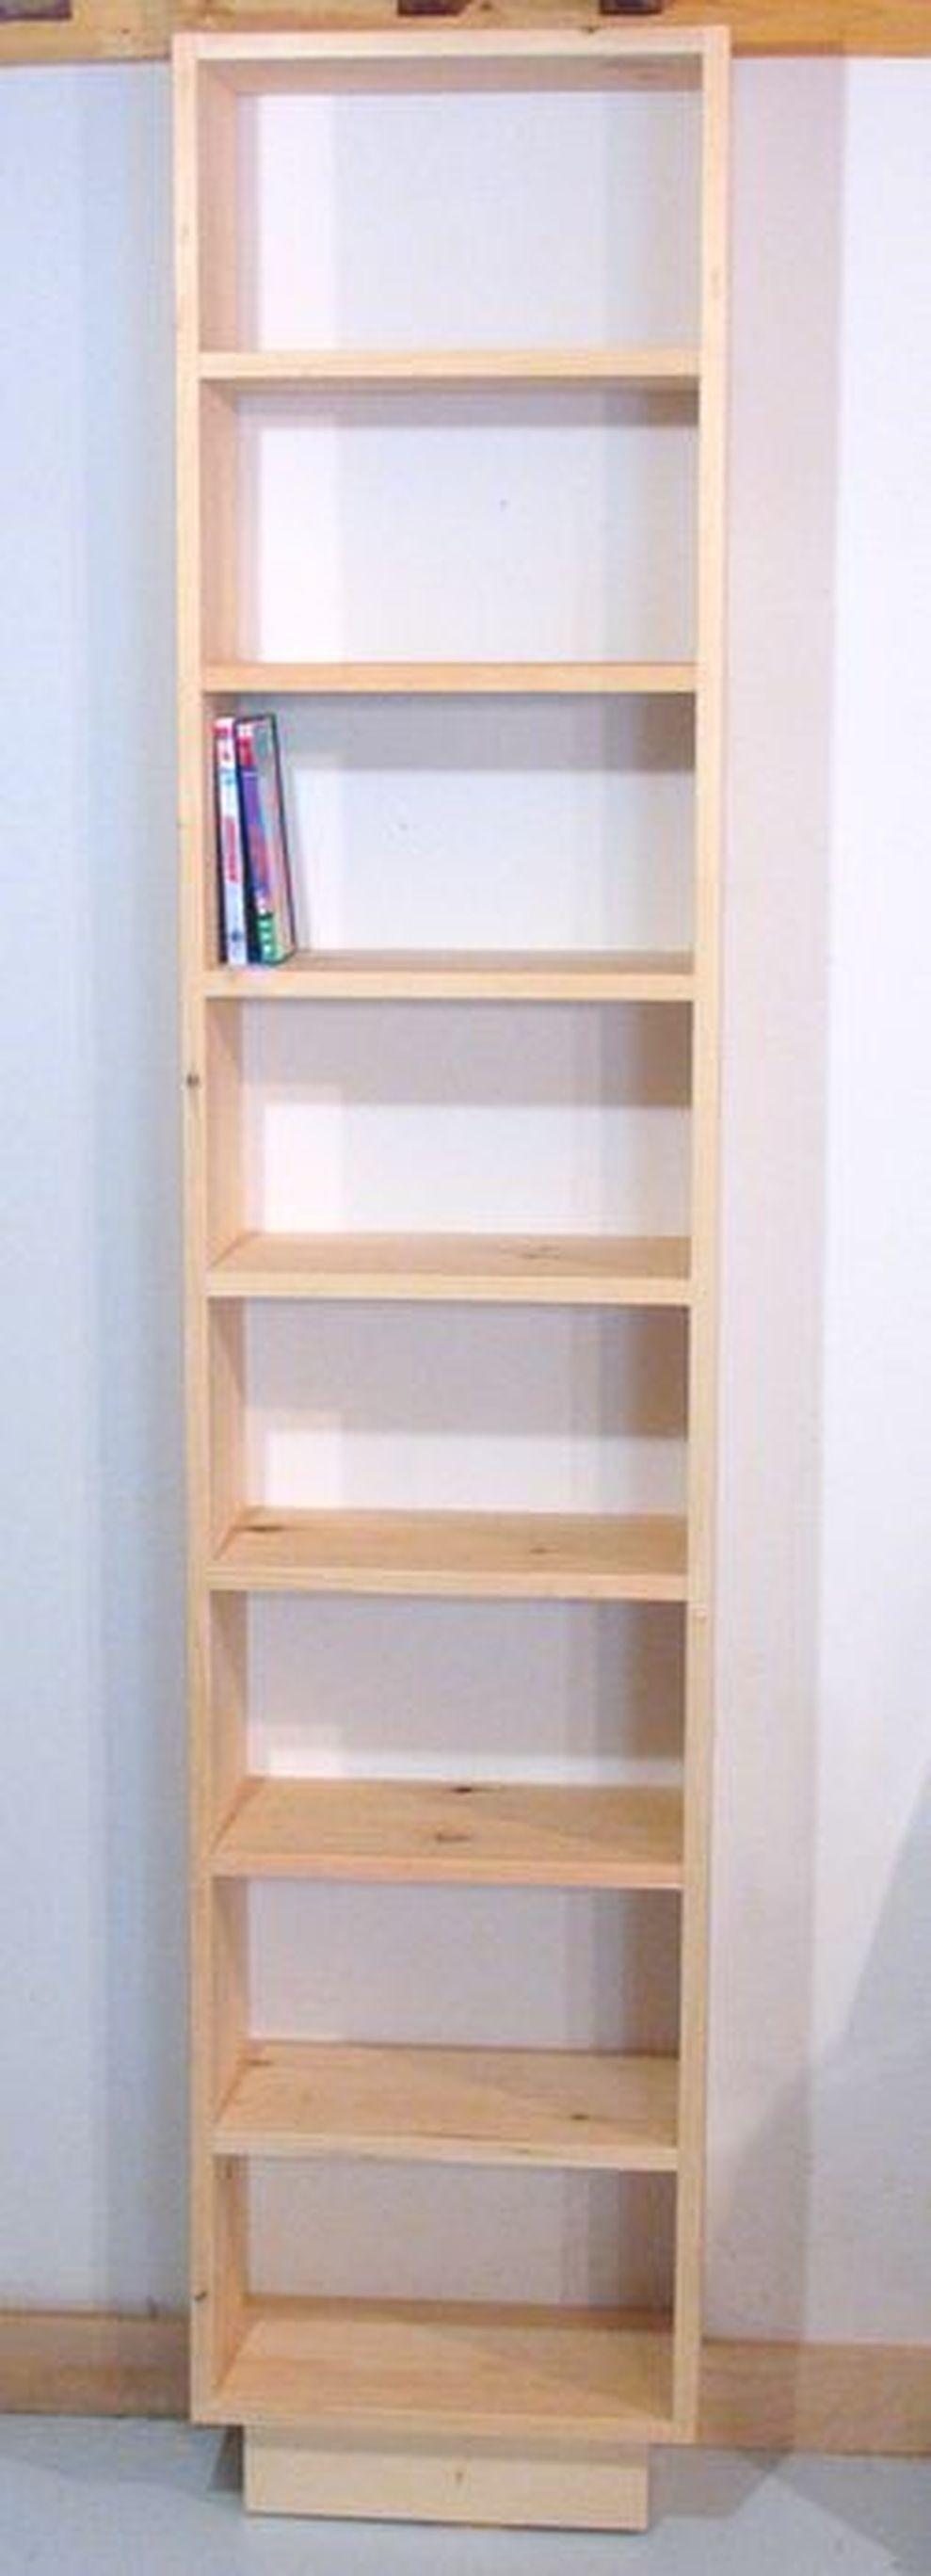 tall narrow storage cabinet ideas on foter rh foter com tall narrow storage cabinet with baskets tall narrow storage cabinet with baskets